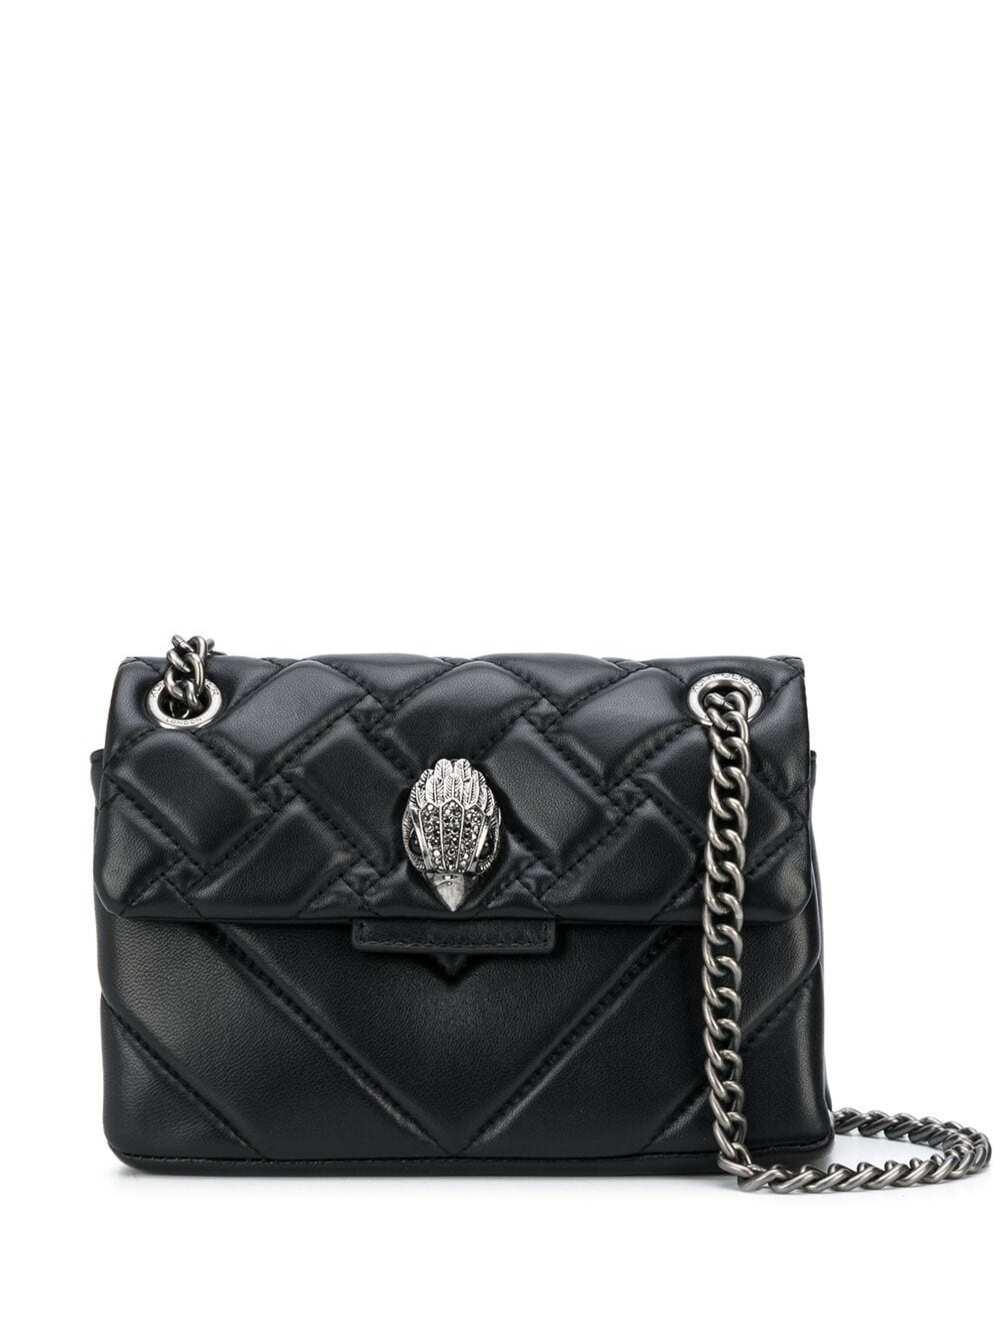 Kensington Black Quilted Leather Crossbody Bag